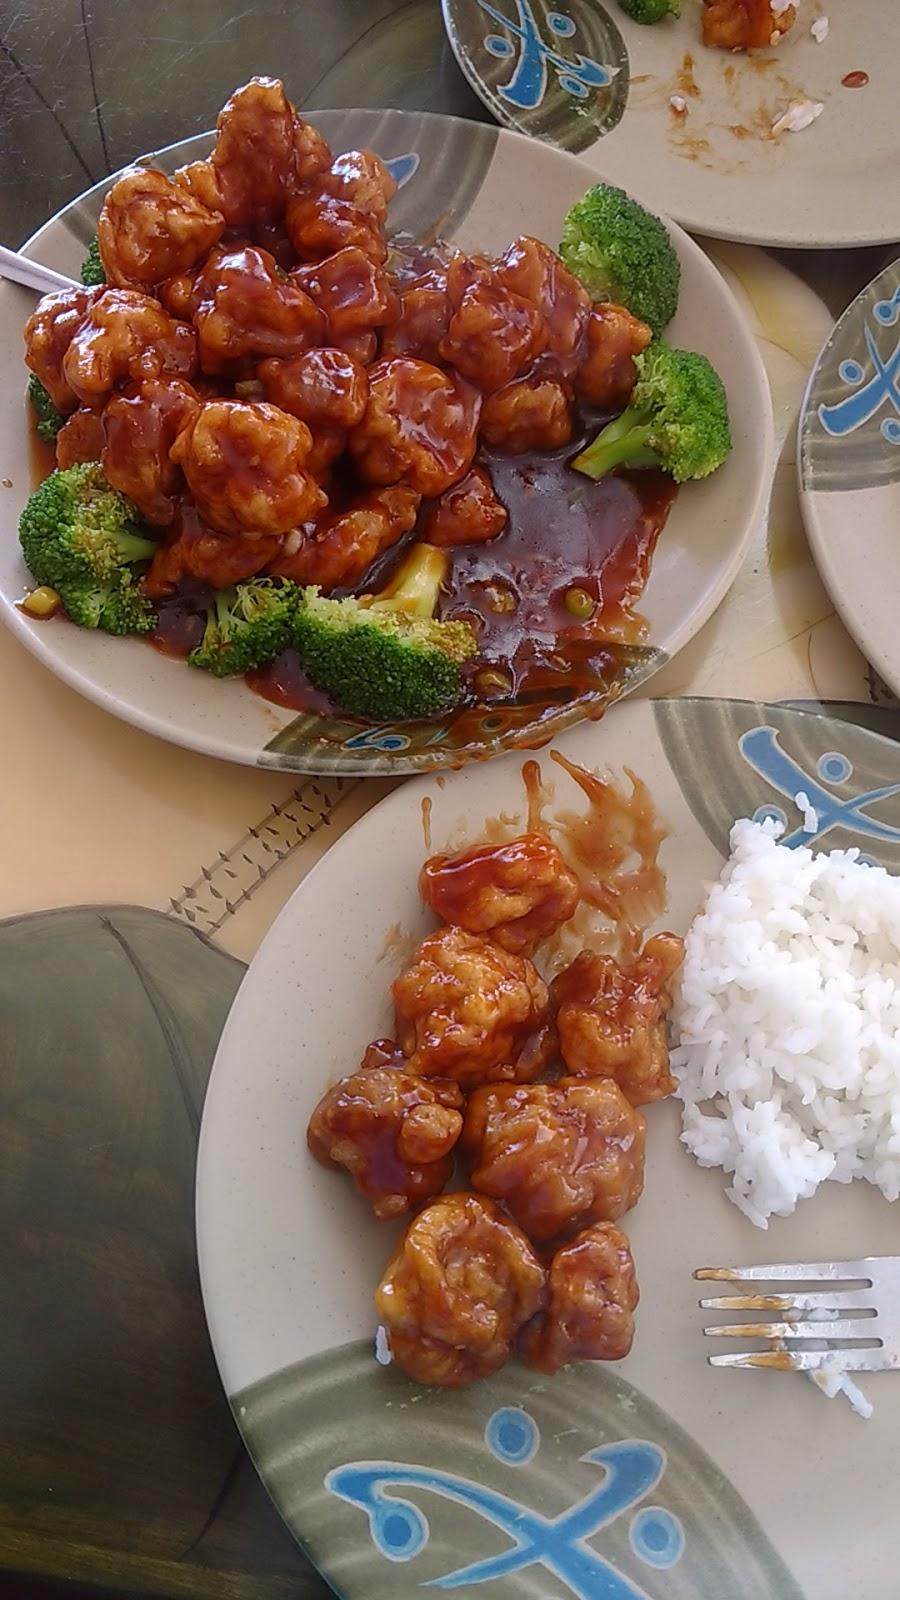 Jade Garden Chinese Restaurant - restaurant  | Photo 6 of 10 | Address: 1577 General Booth Blvd #106, Virginia Beach, VA 23454, USA | Phone: (757) 428-7114